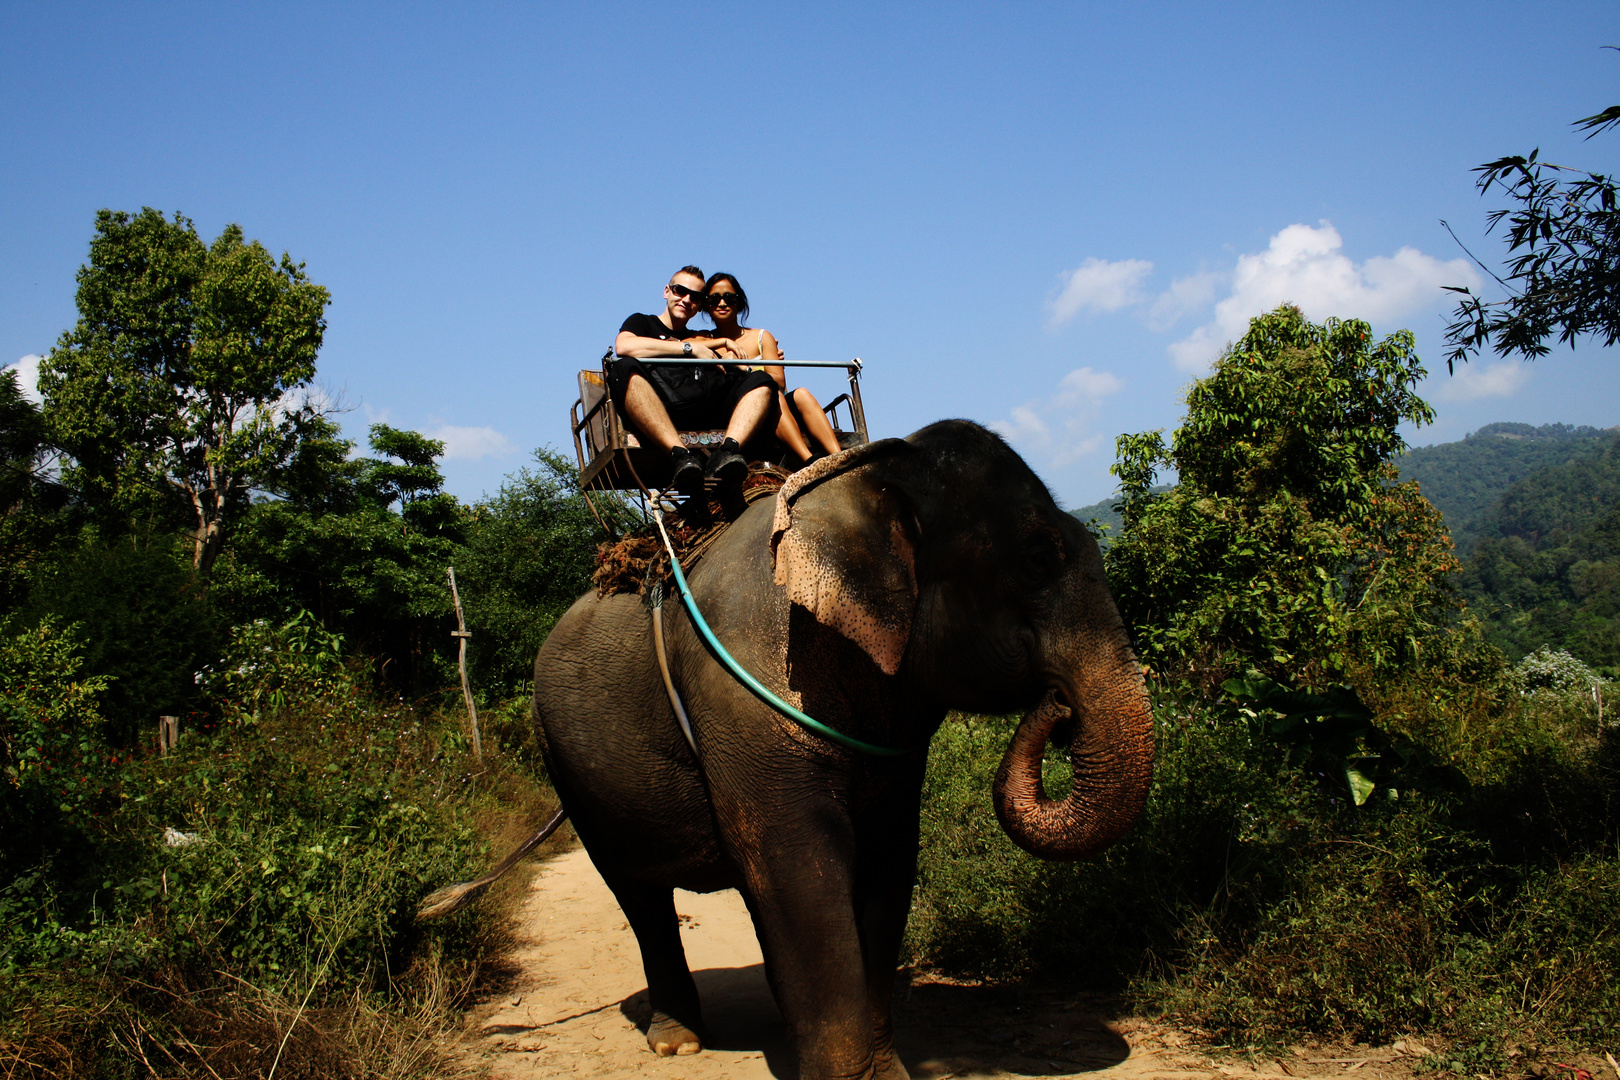 Elephant ride at Chiang Mai